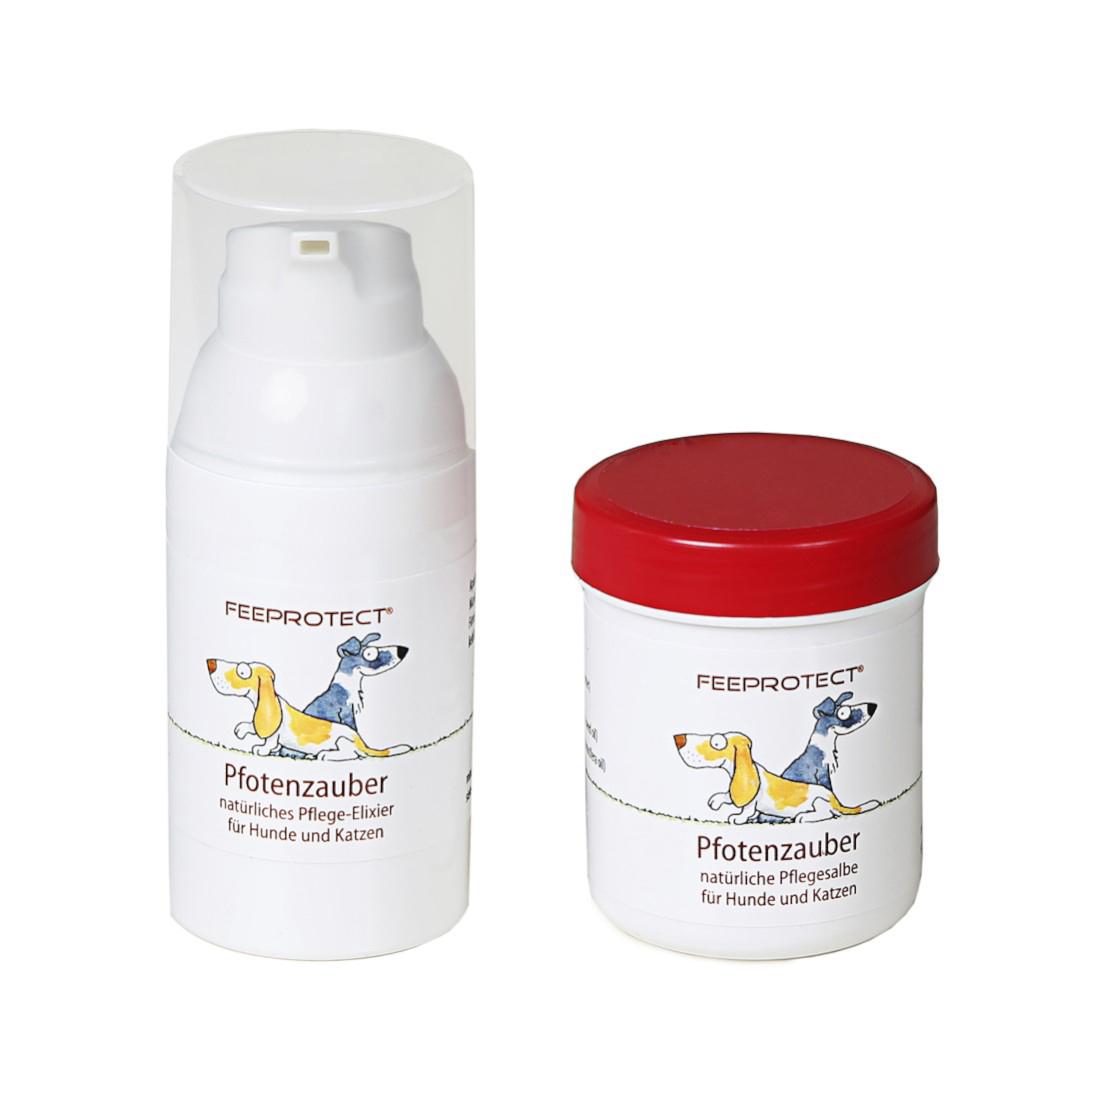 Feeprotect ® Pfotenzauber-Set